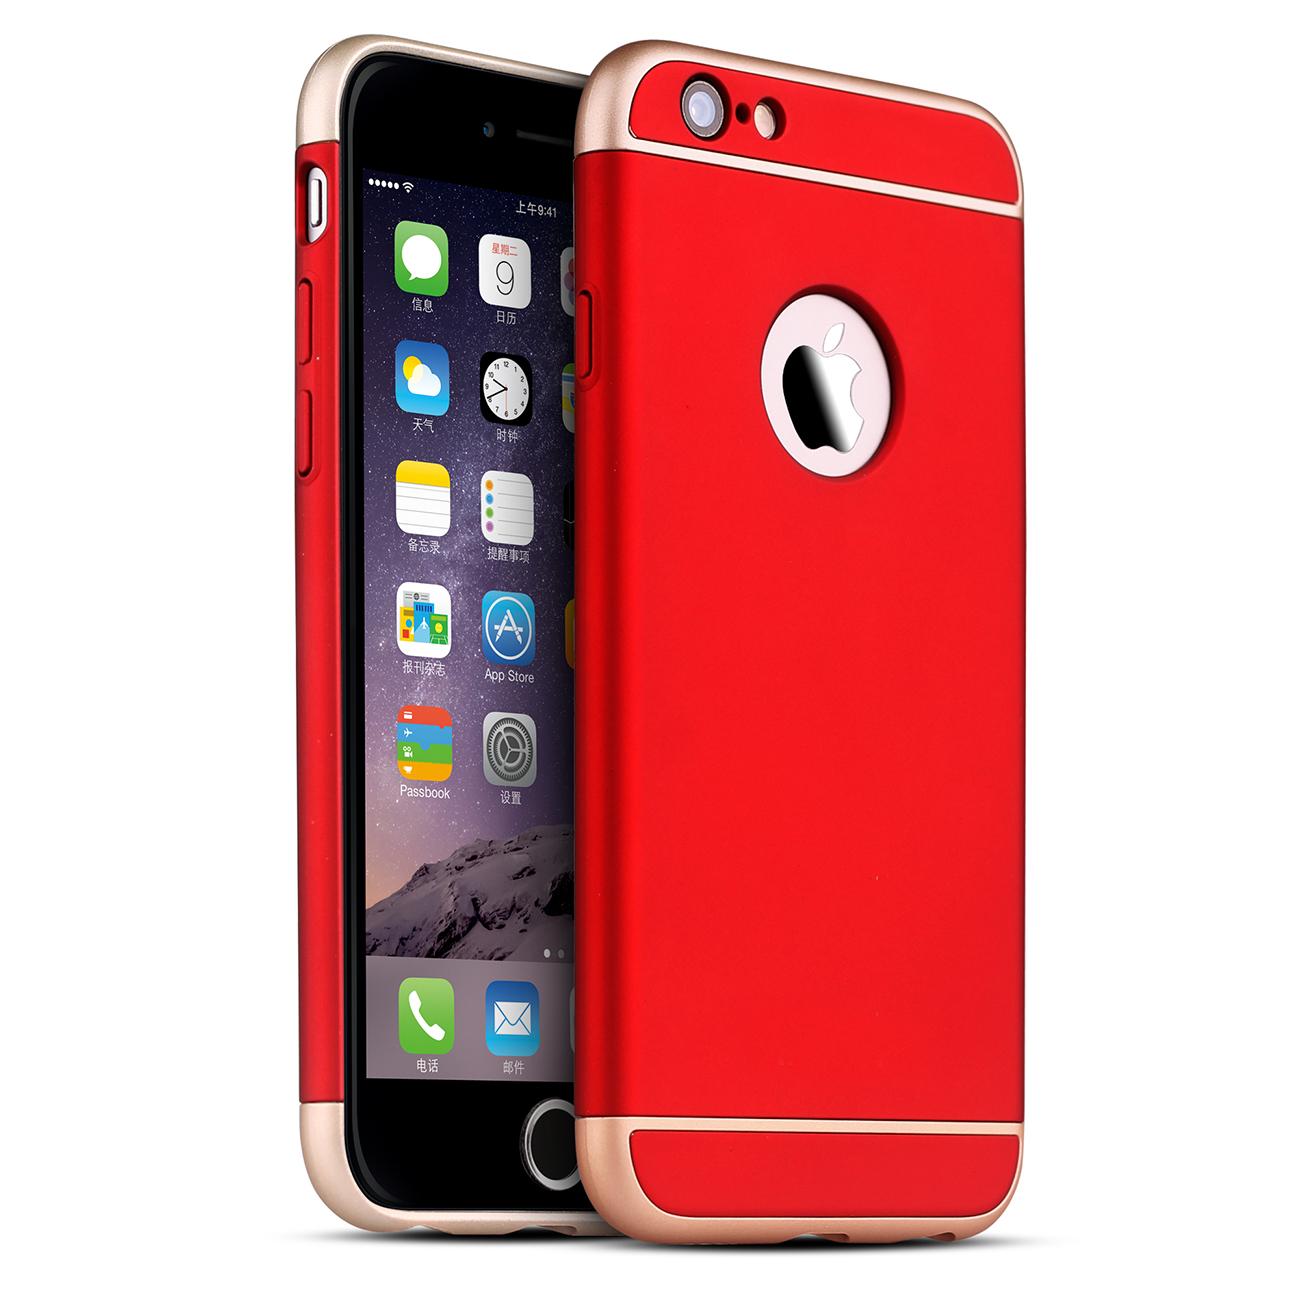 gummierte rot schutzh lle von vapiao f r apple iphone. Black Bedroom Furniture Sets. Home Design Ideas